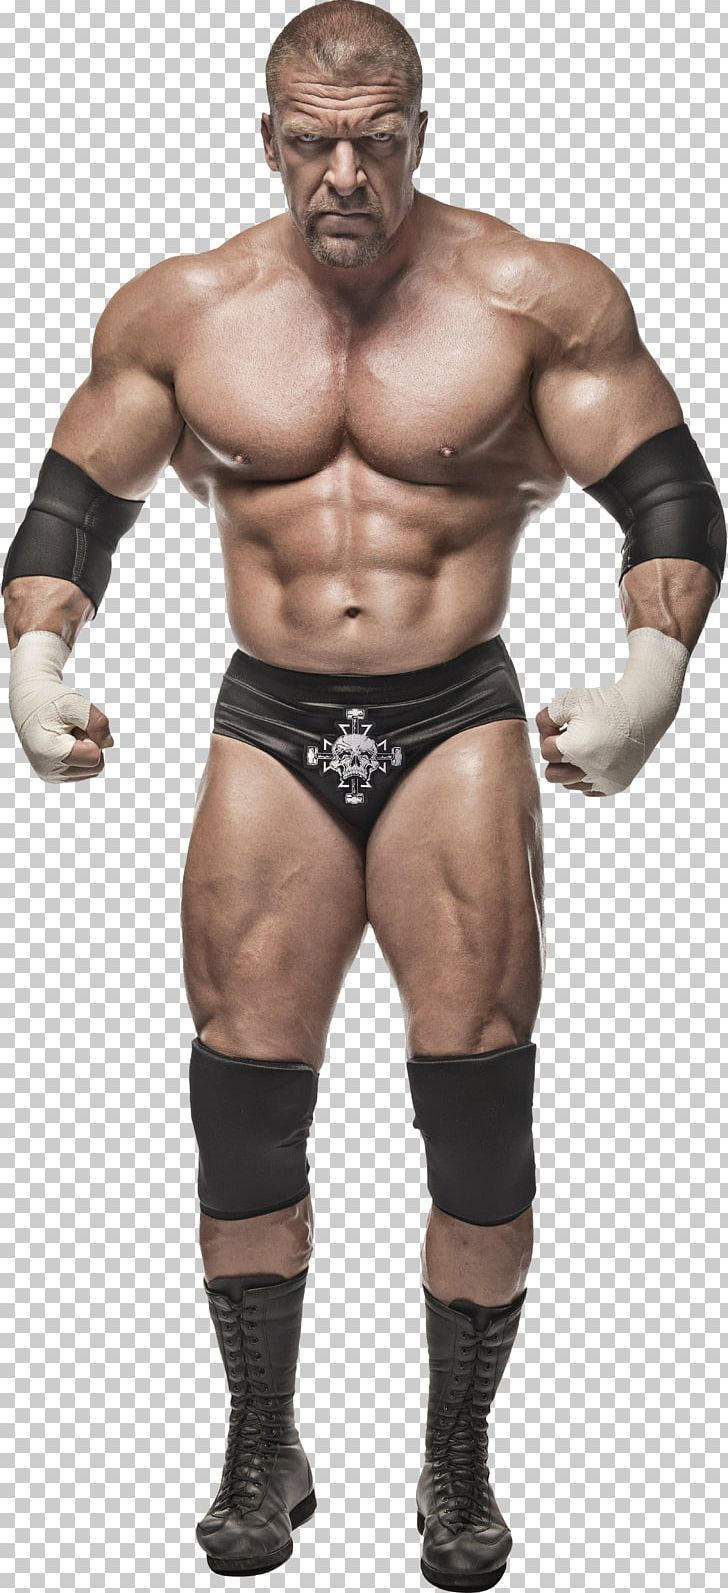 Triple H World Heavyweight Championship Wrestlemania 29 Wwe Championship Wwe Superstar World Heavyweight Championship Wwe Superstars Wwe Superstar Roman Reigns